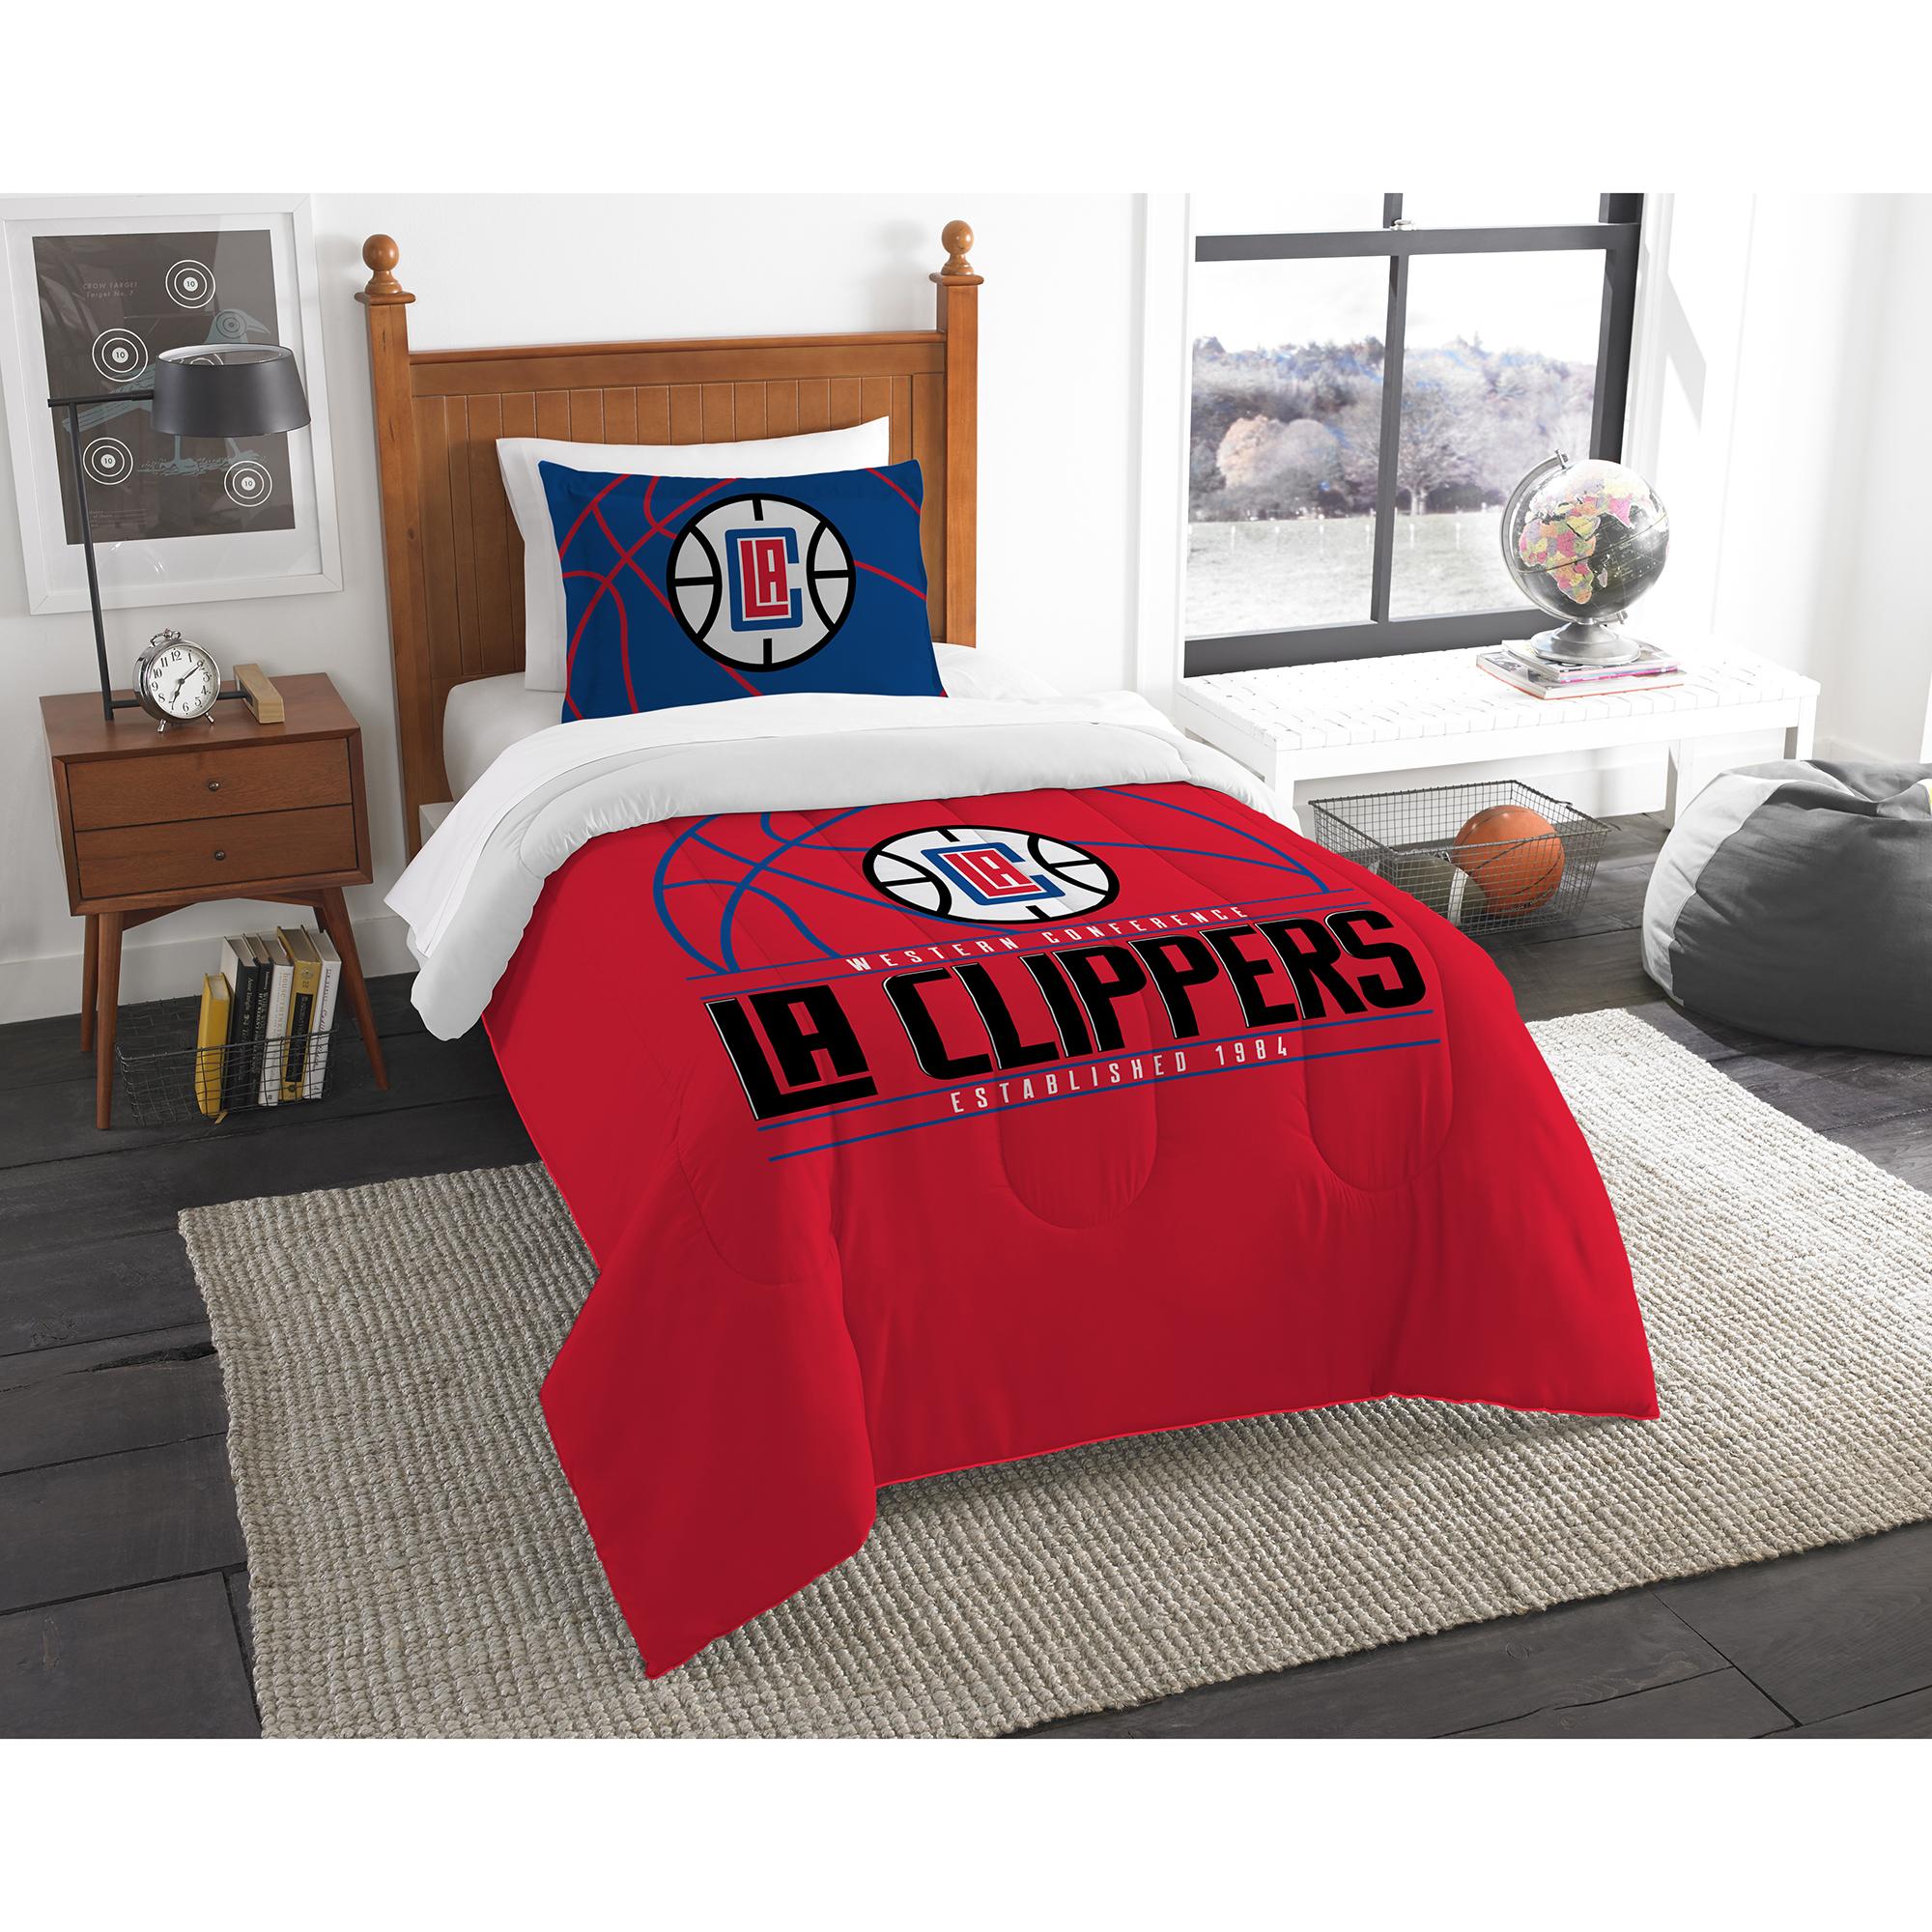 LA Clippers The Northwest Company Reverse Slam Twin Comforter Set - No Size